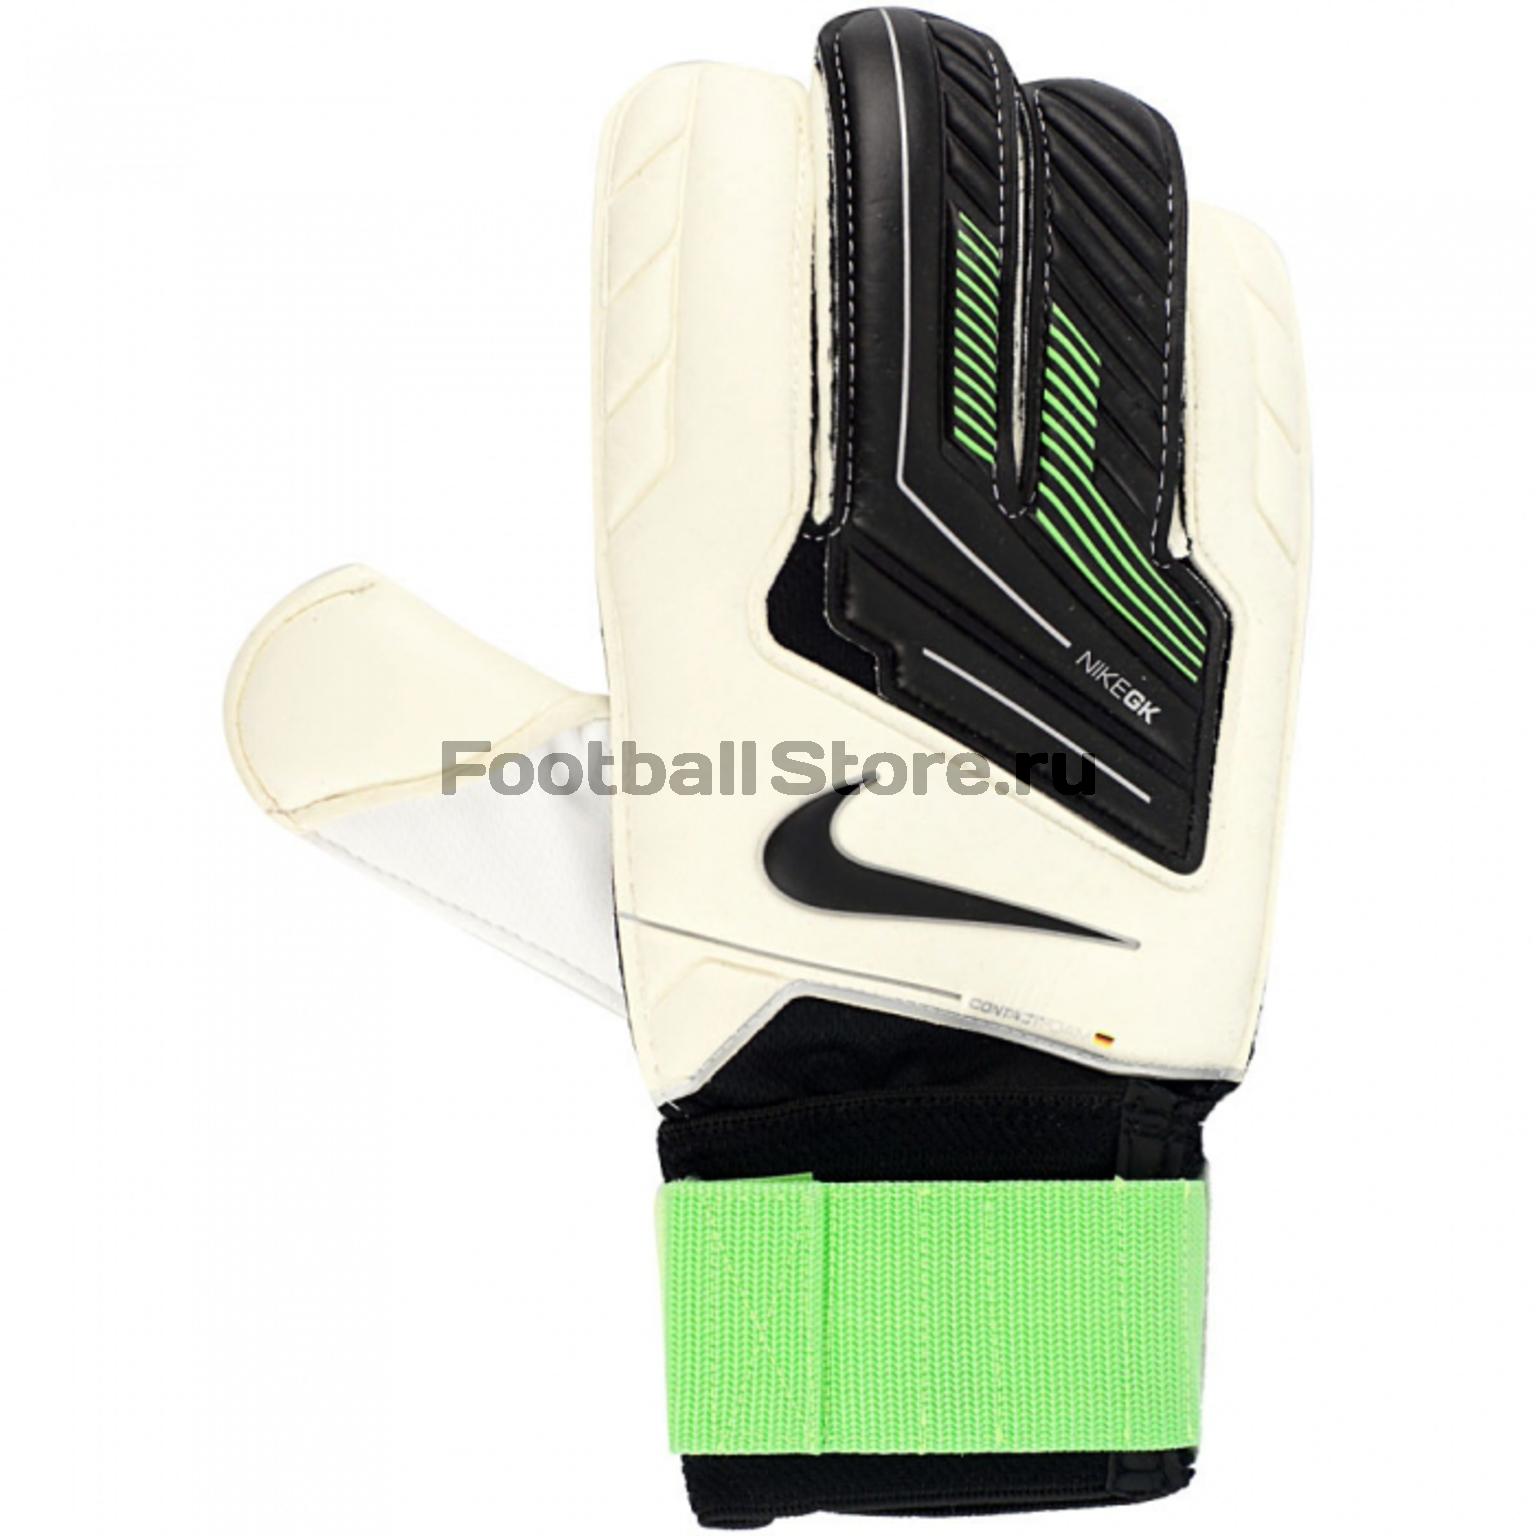 Перчатки Nike Вратарские перчатки Nike gk gunn cut